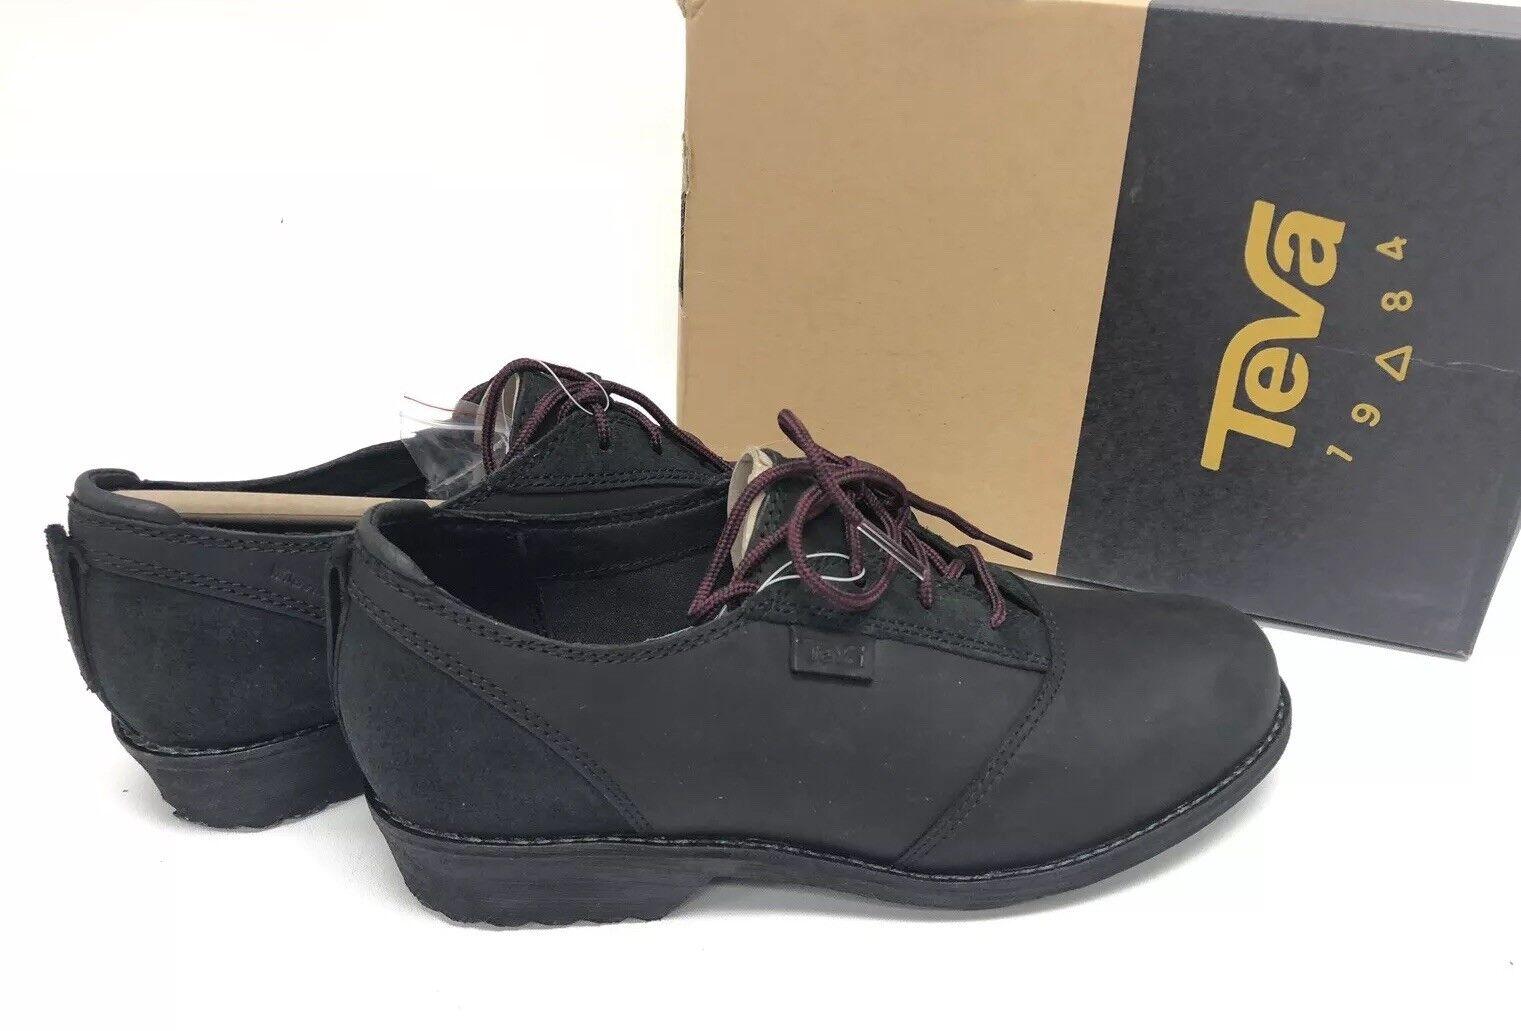 Teva Women's De La Vina Dos Shoe Black Lace Up 1019810 Oxford Waterproof sizes